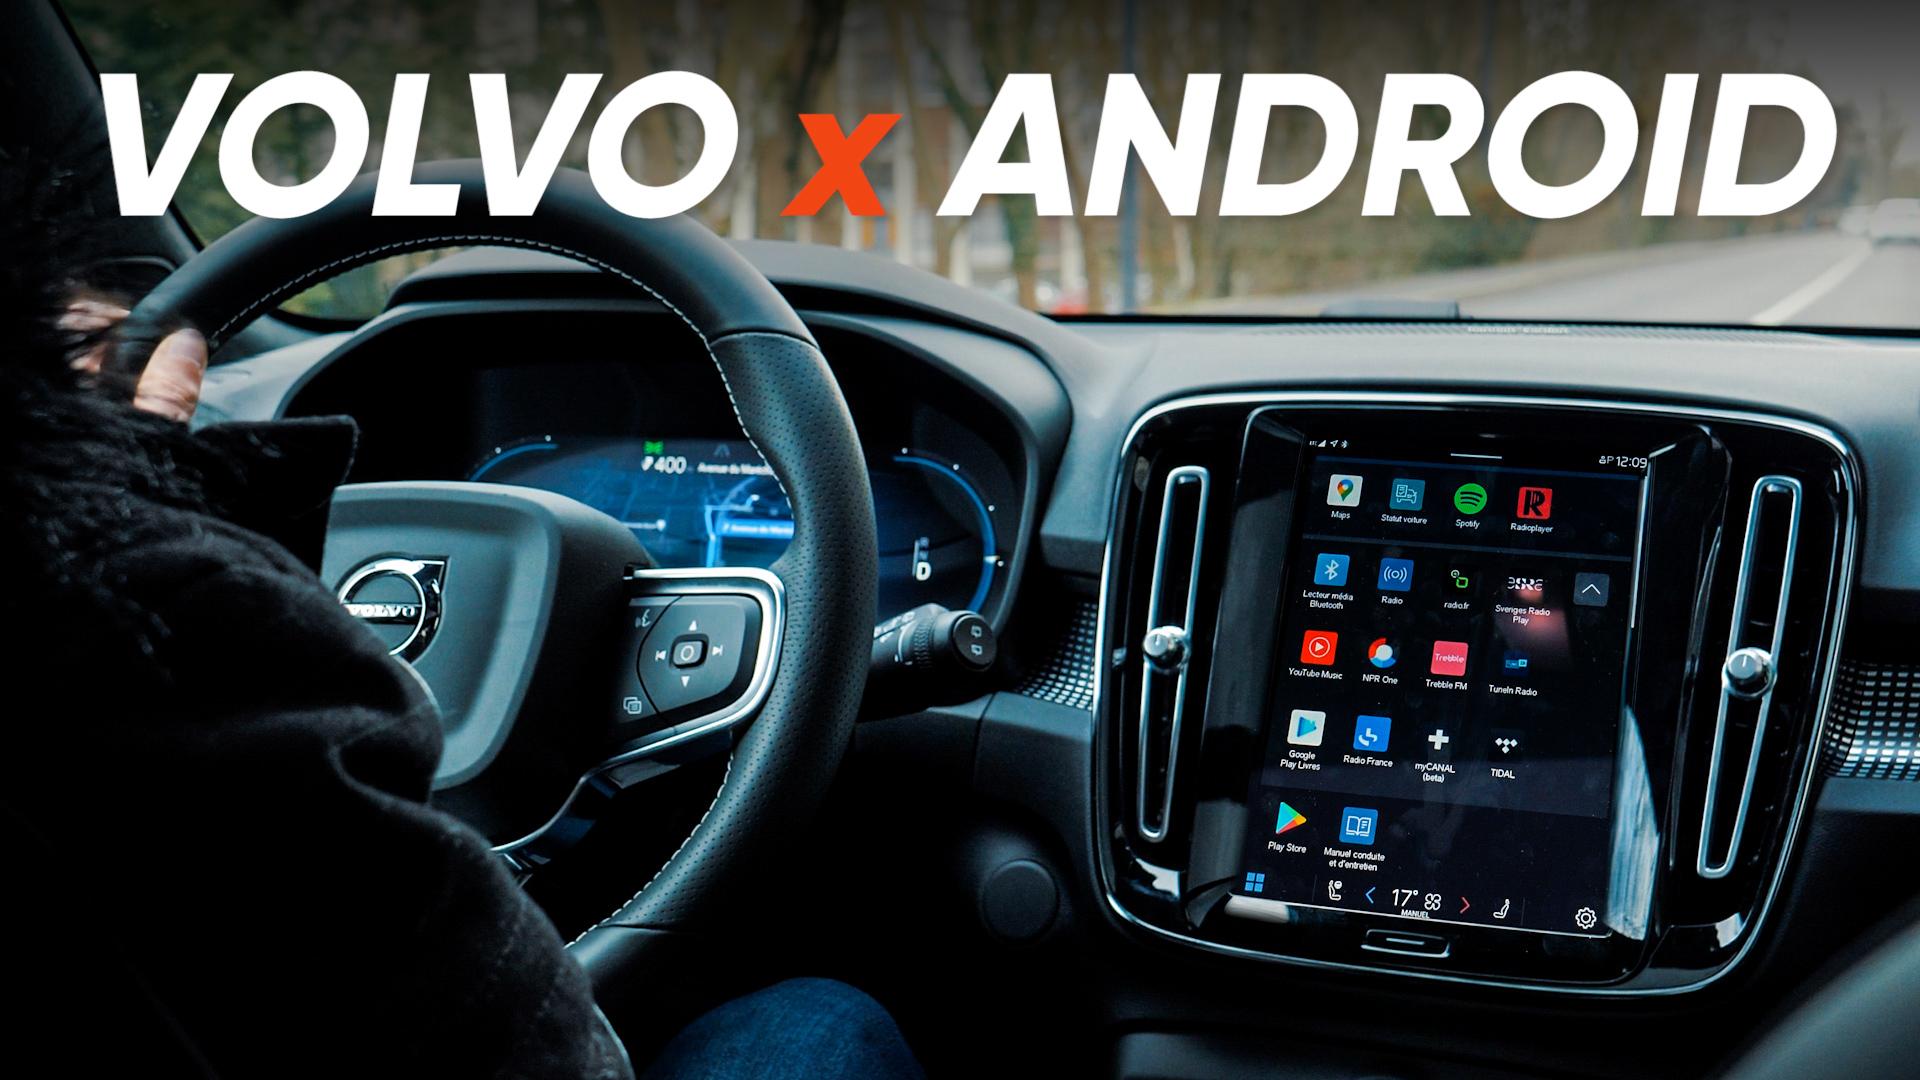 On teste l'interface Android qui équipera votre prochaine voiture !